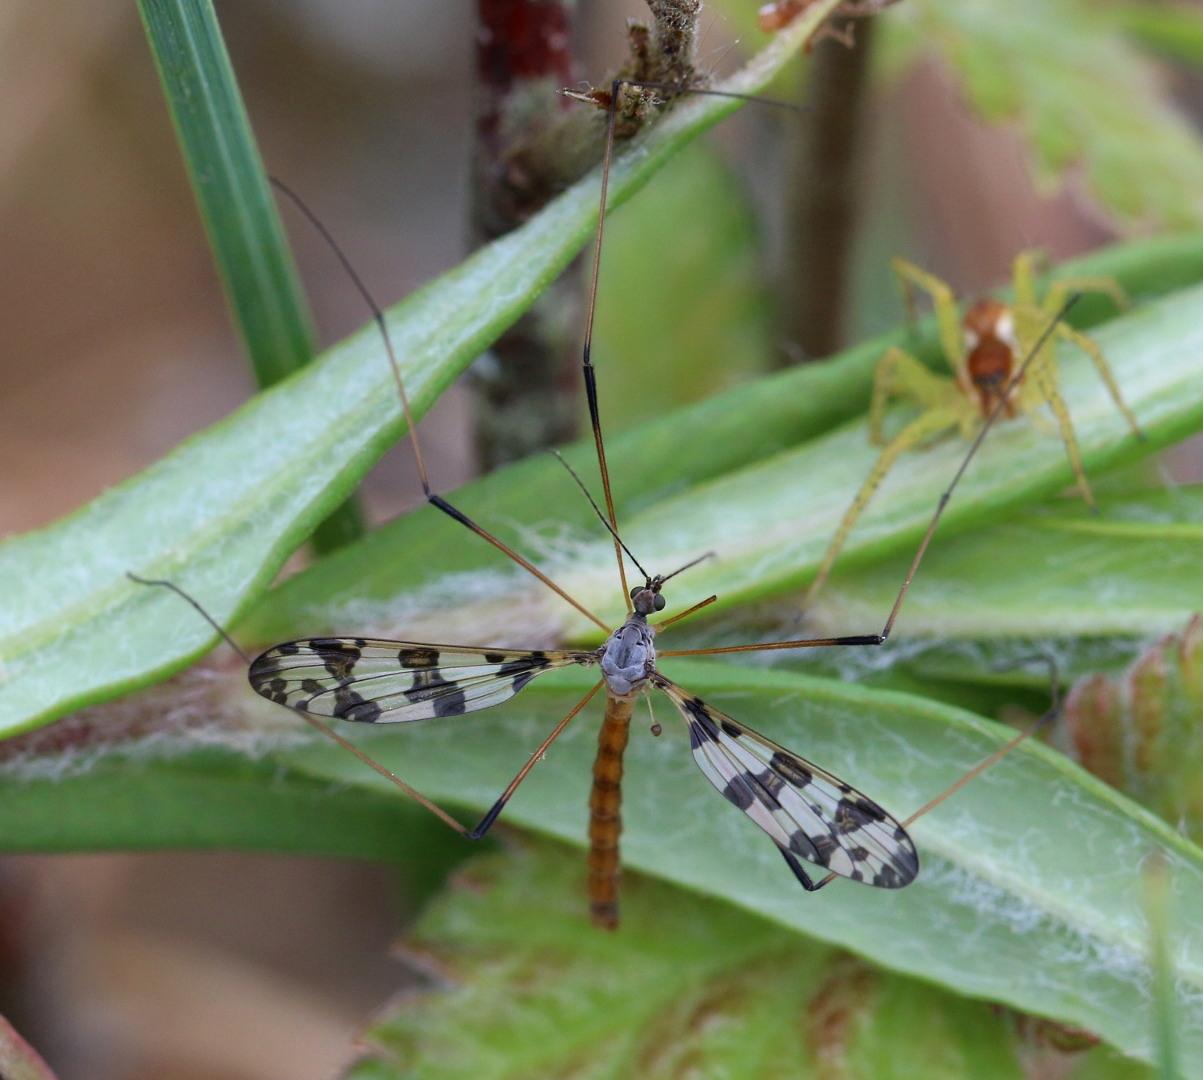 Idioptera linnei